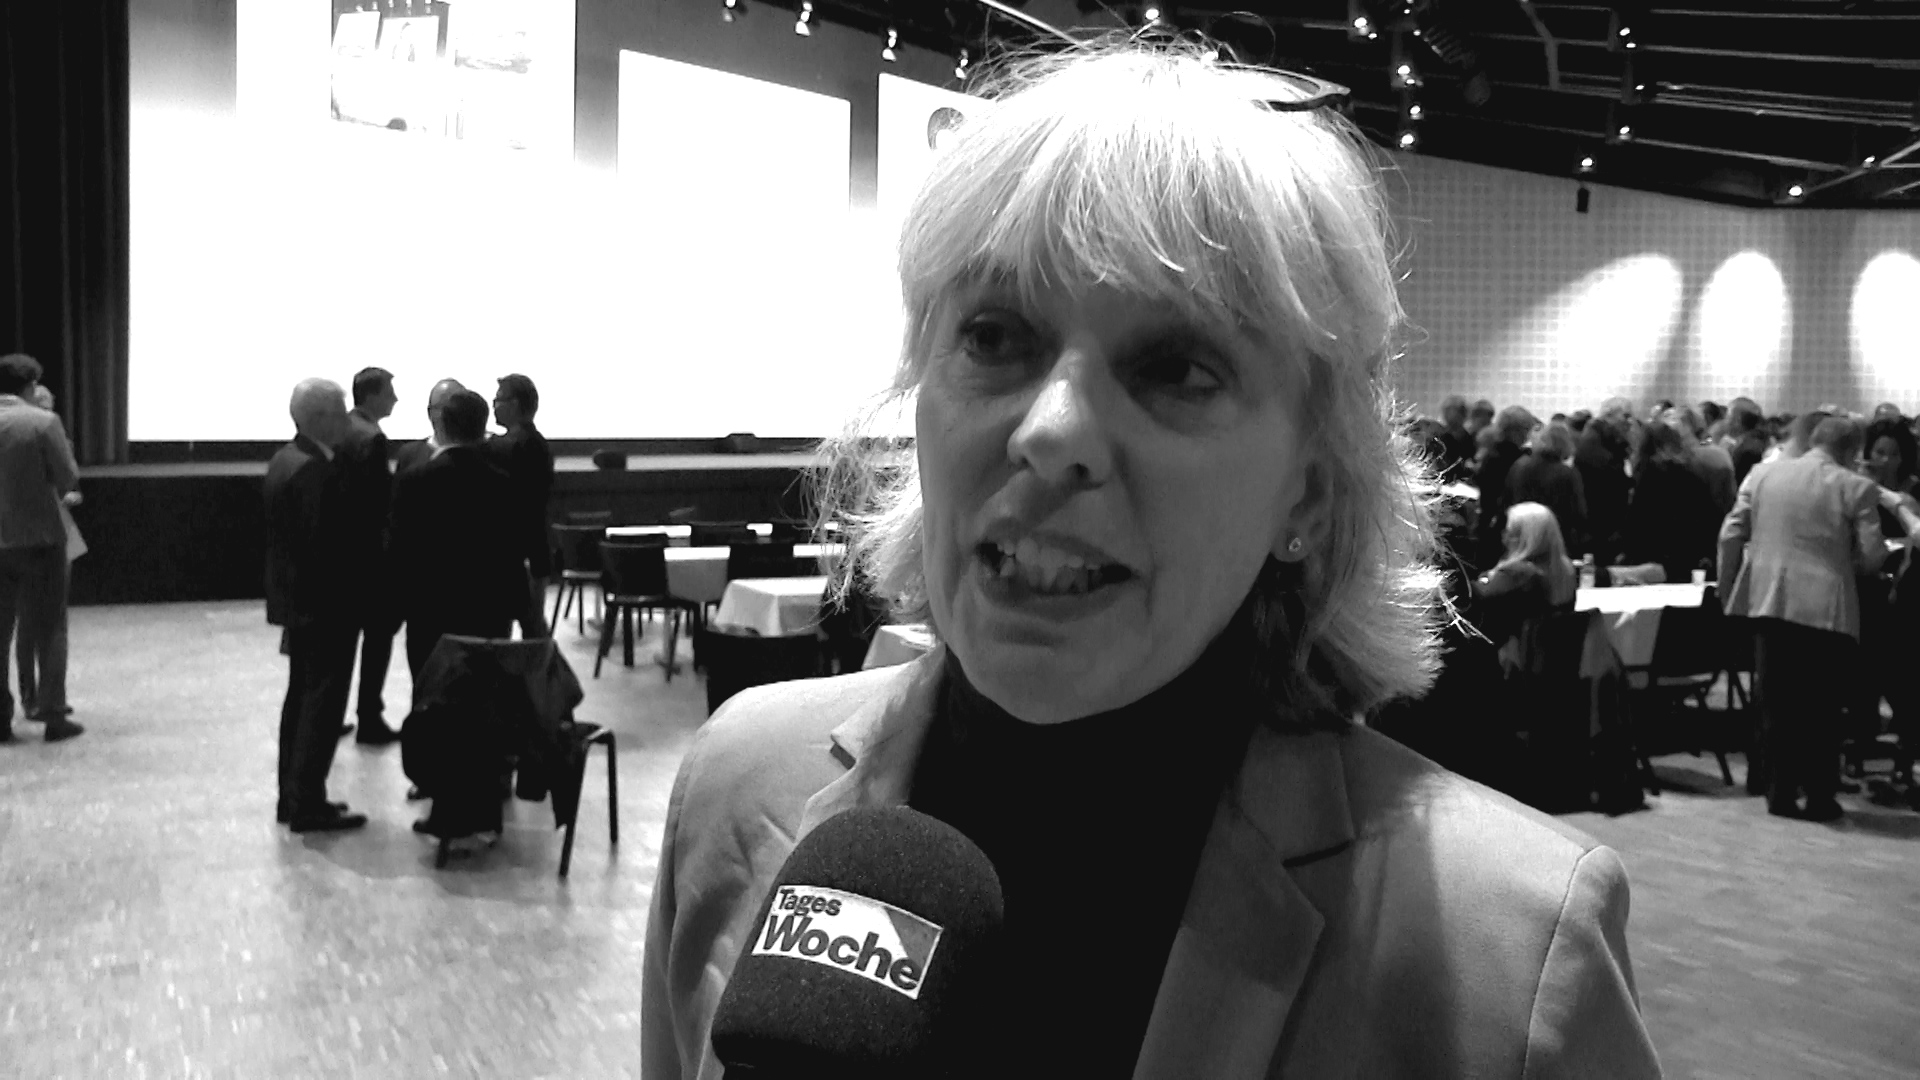 Brigitte Hollinger